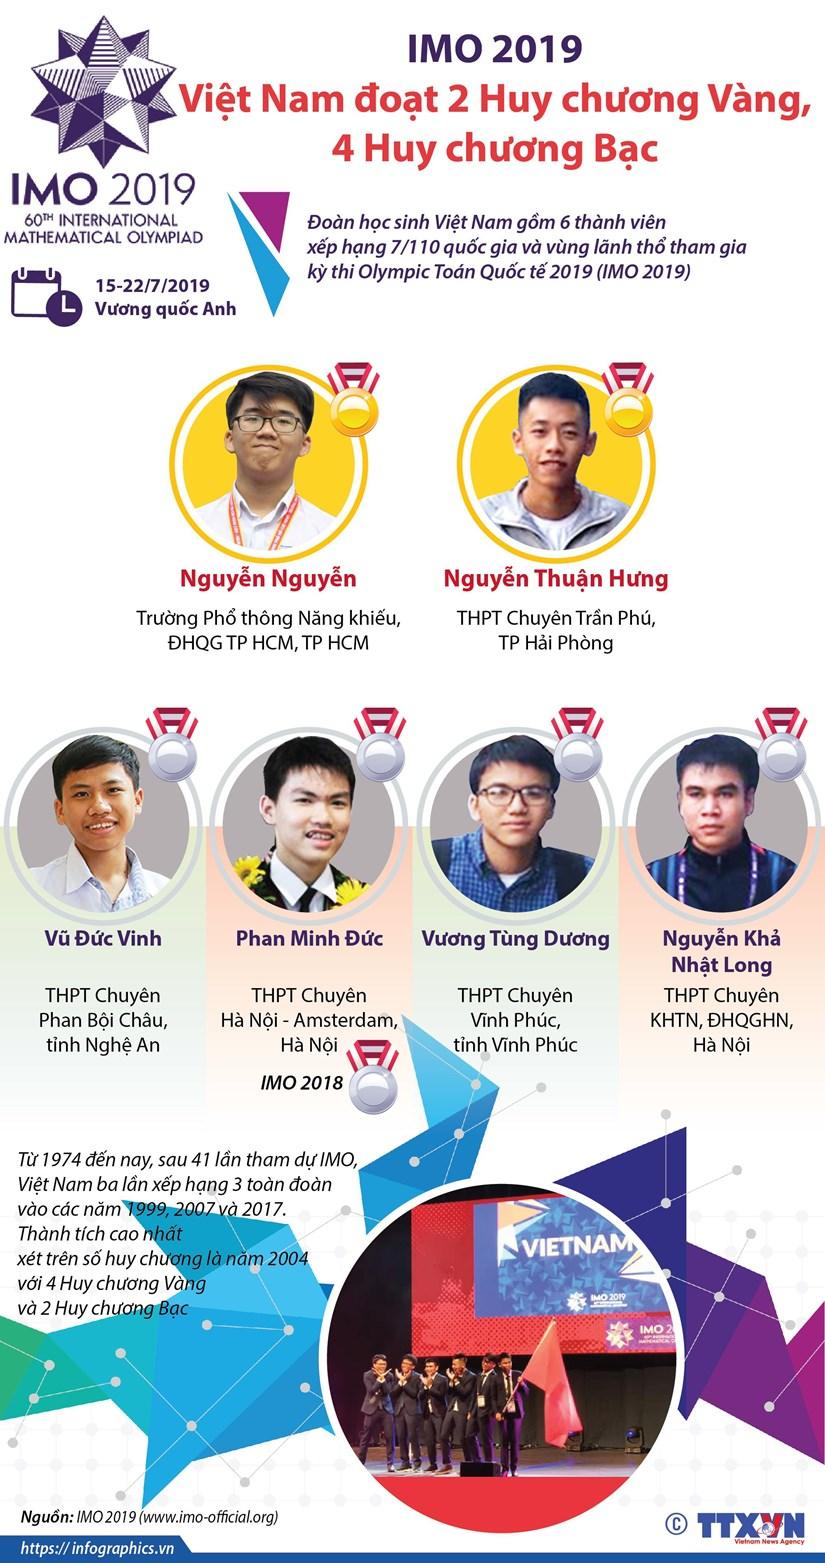 IMO 2019: Viet Nam doat 2 huy chuong vang, 4 huy chuong bac hinh anh 1